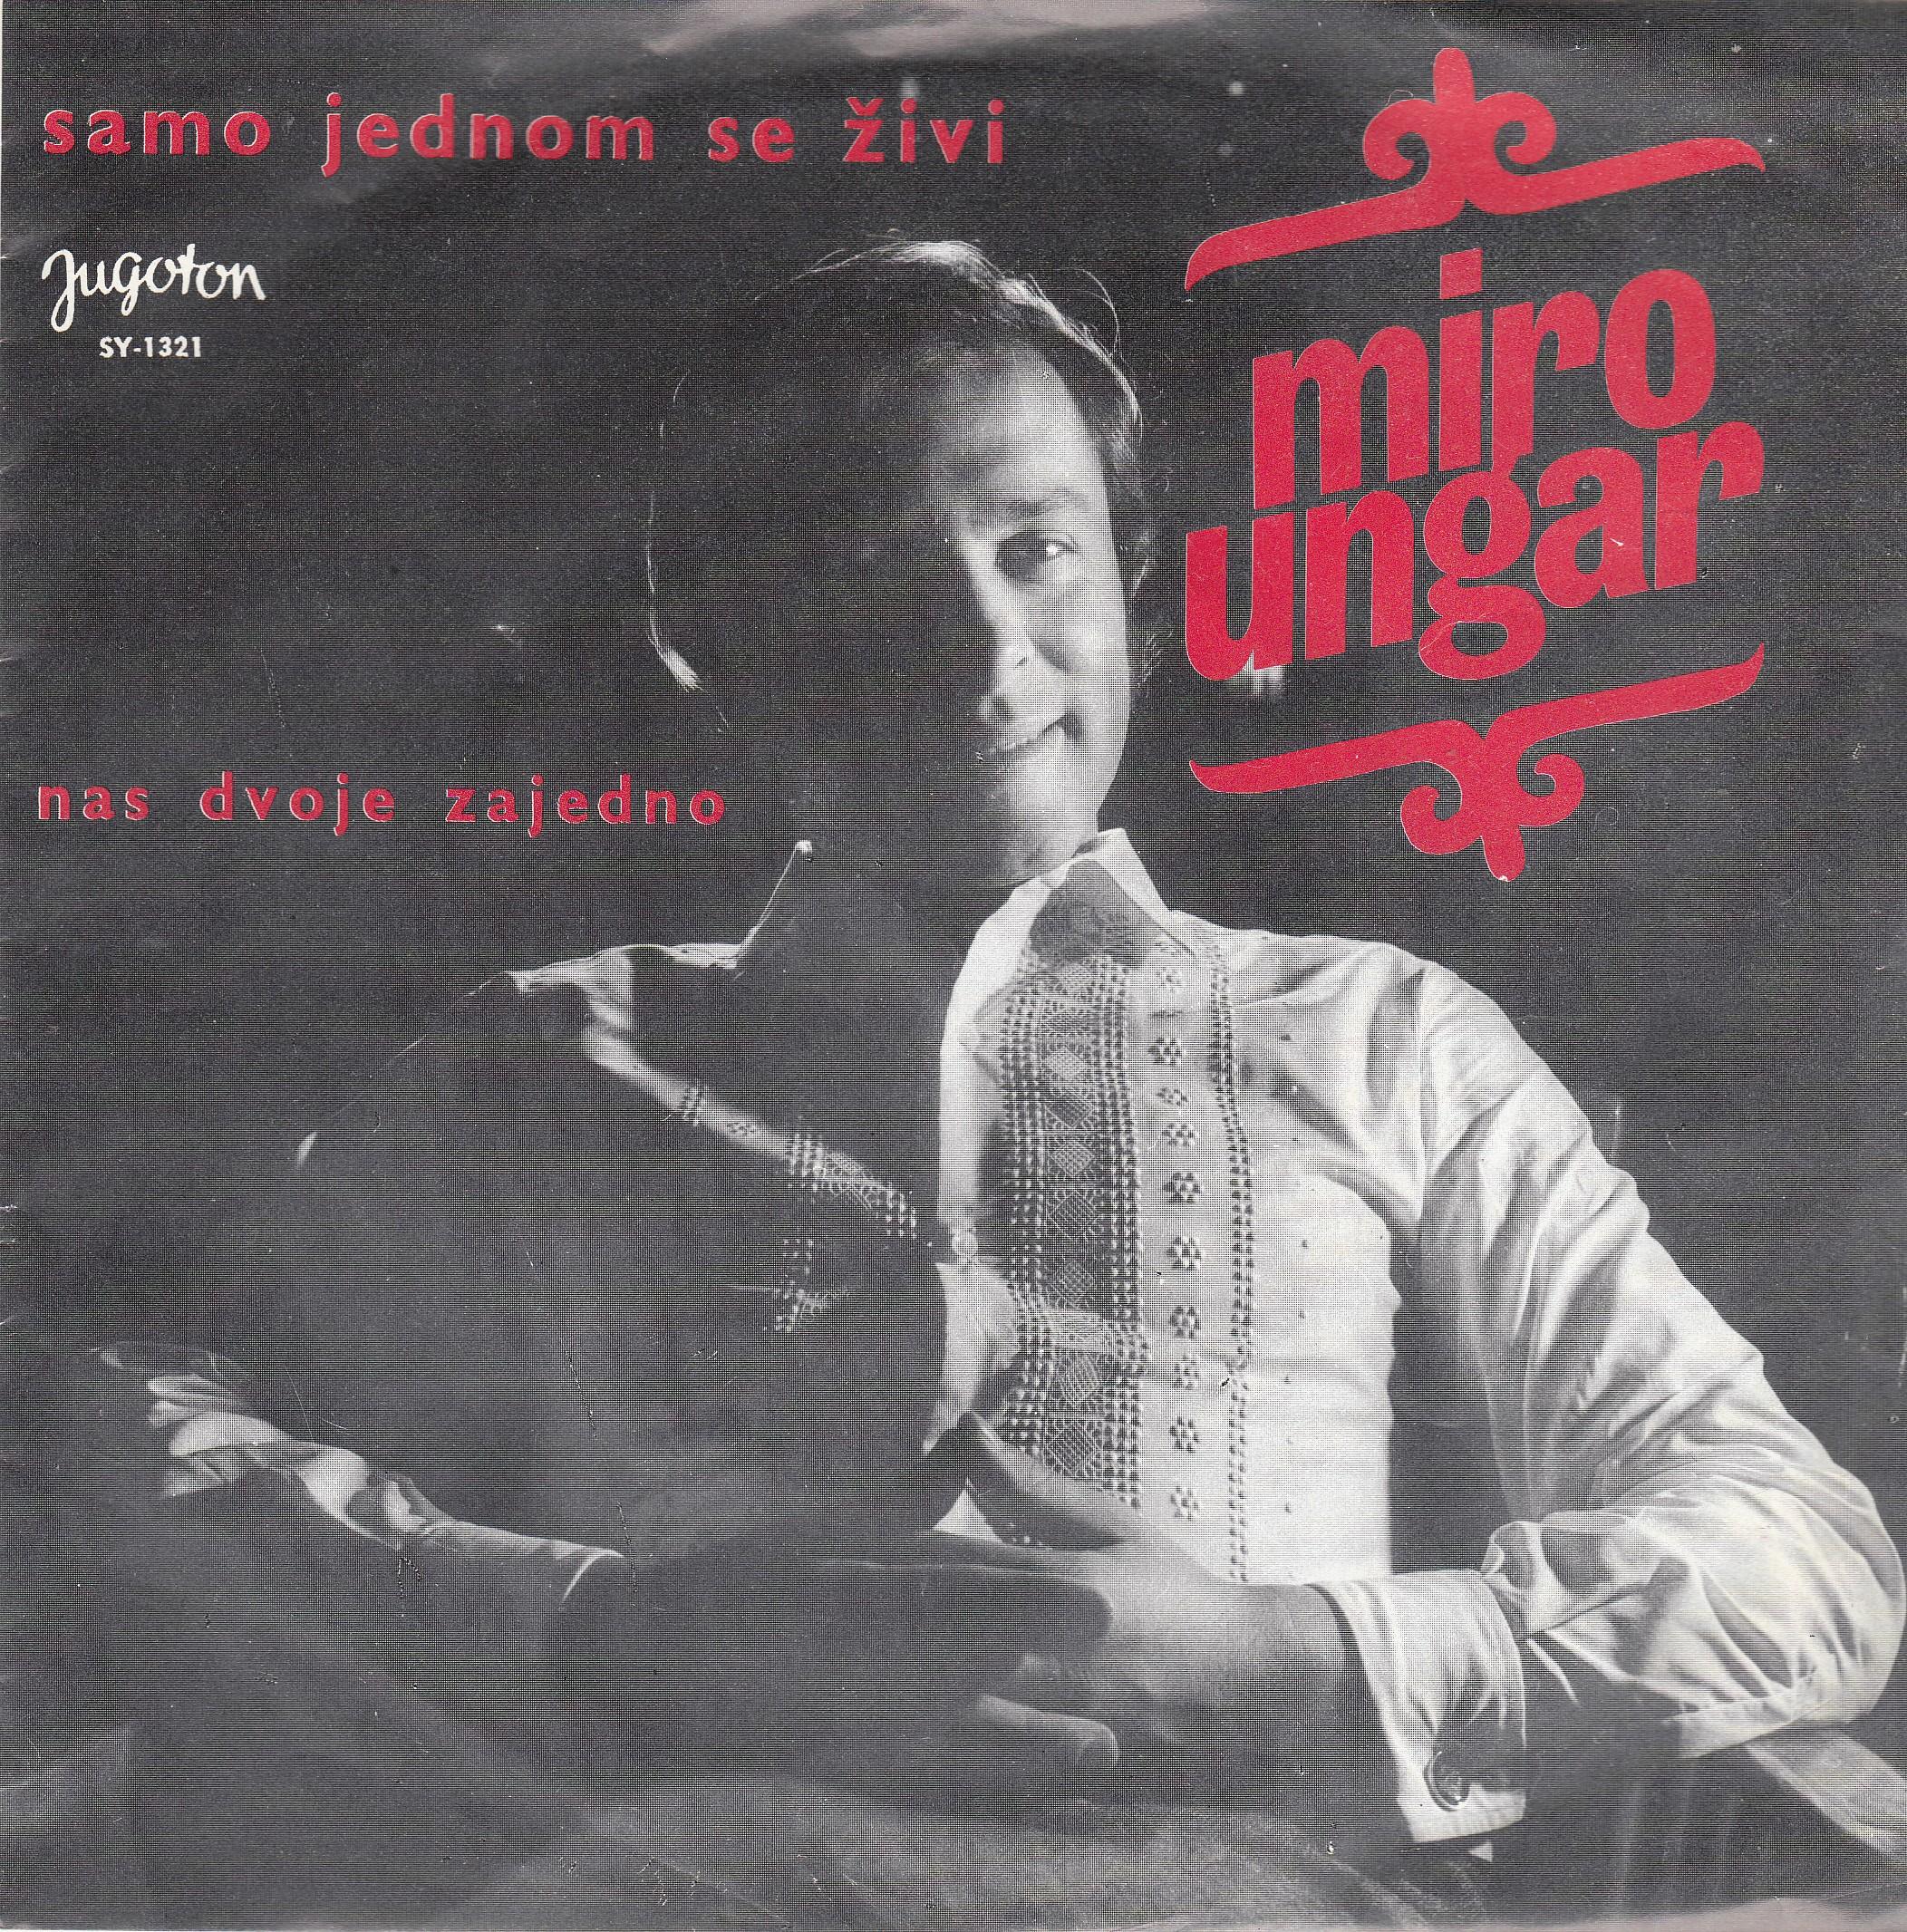 Ungar Miro - Nas Dvoje Zajedno Ensemble/samo Jednom Se Zivi